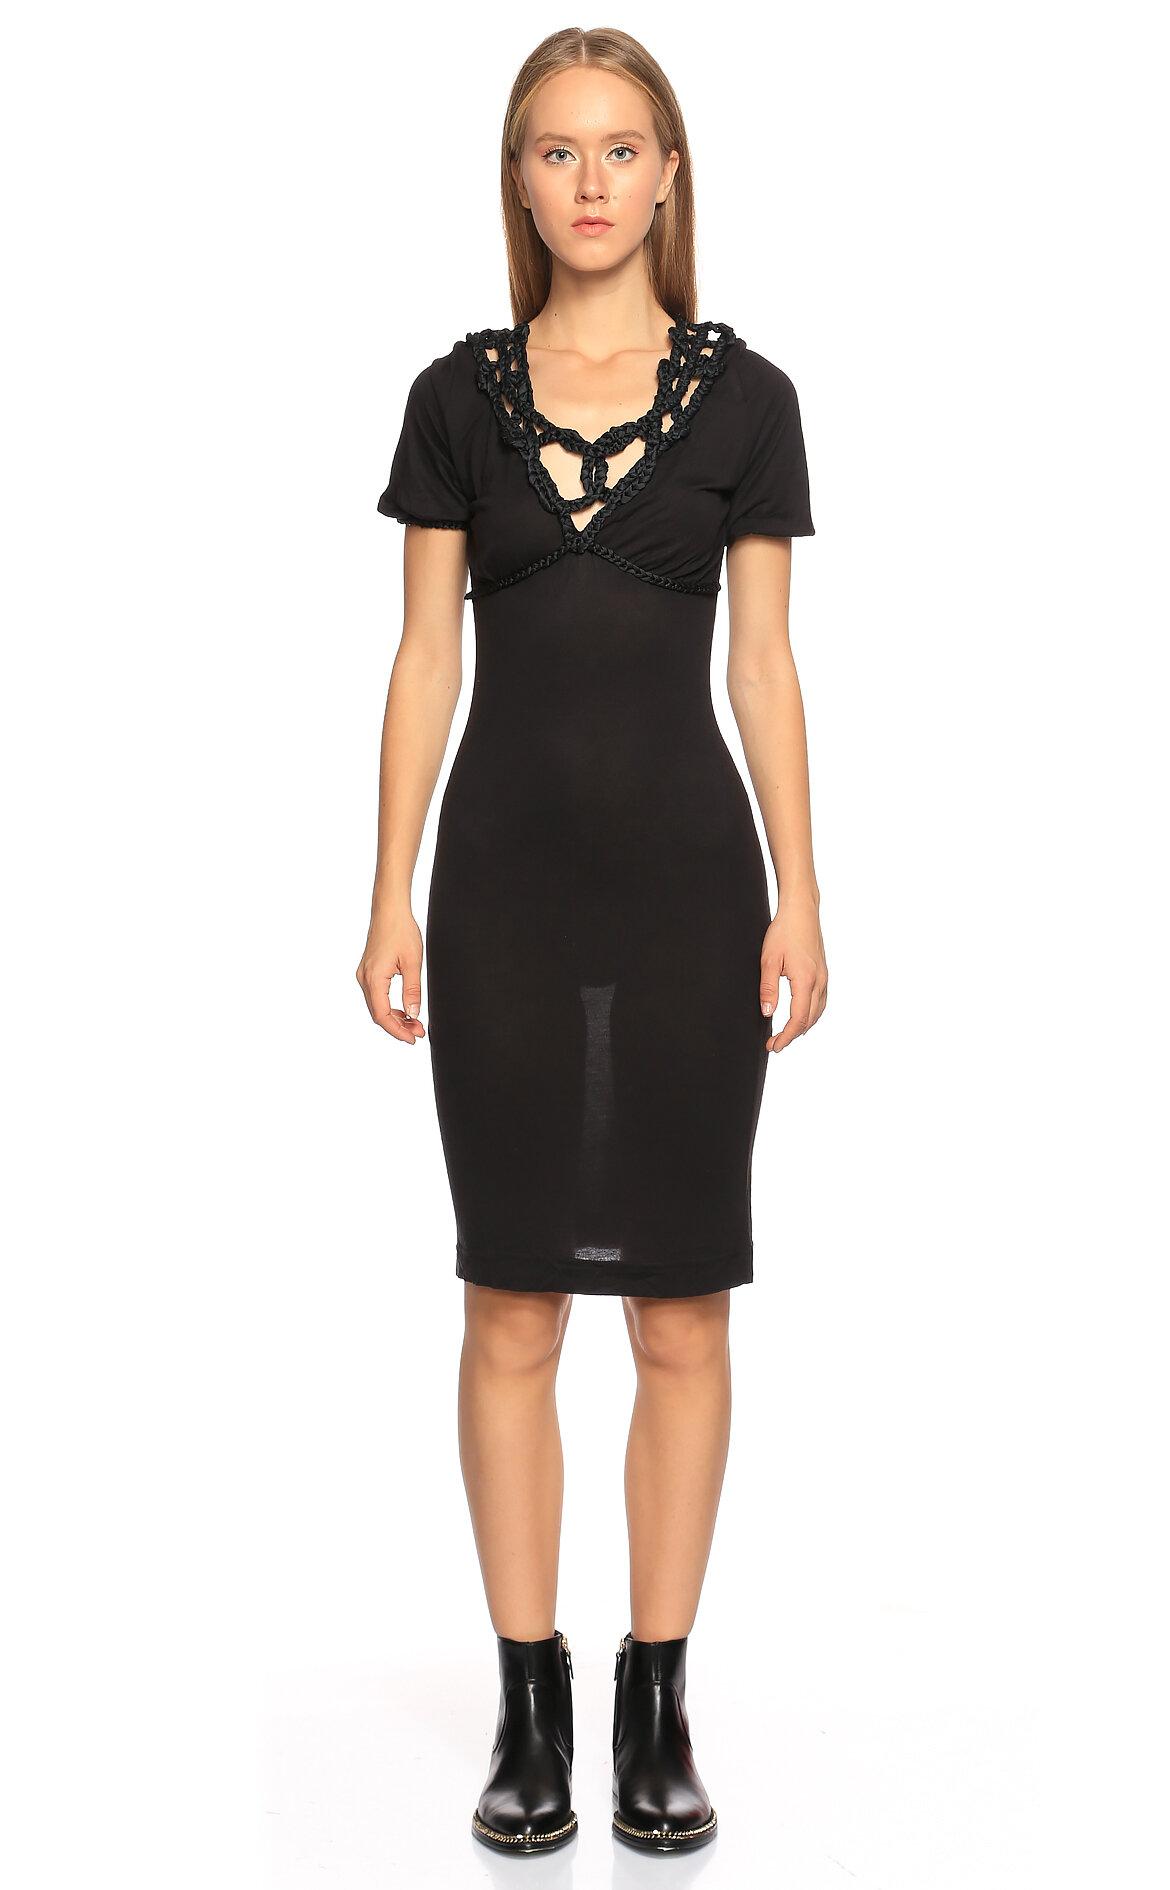 Just Cavalli-Just Cavalli Yakası İp Detaylı Kısa Kollu Siyah Elbise